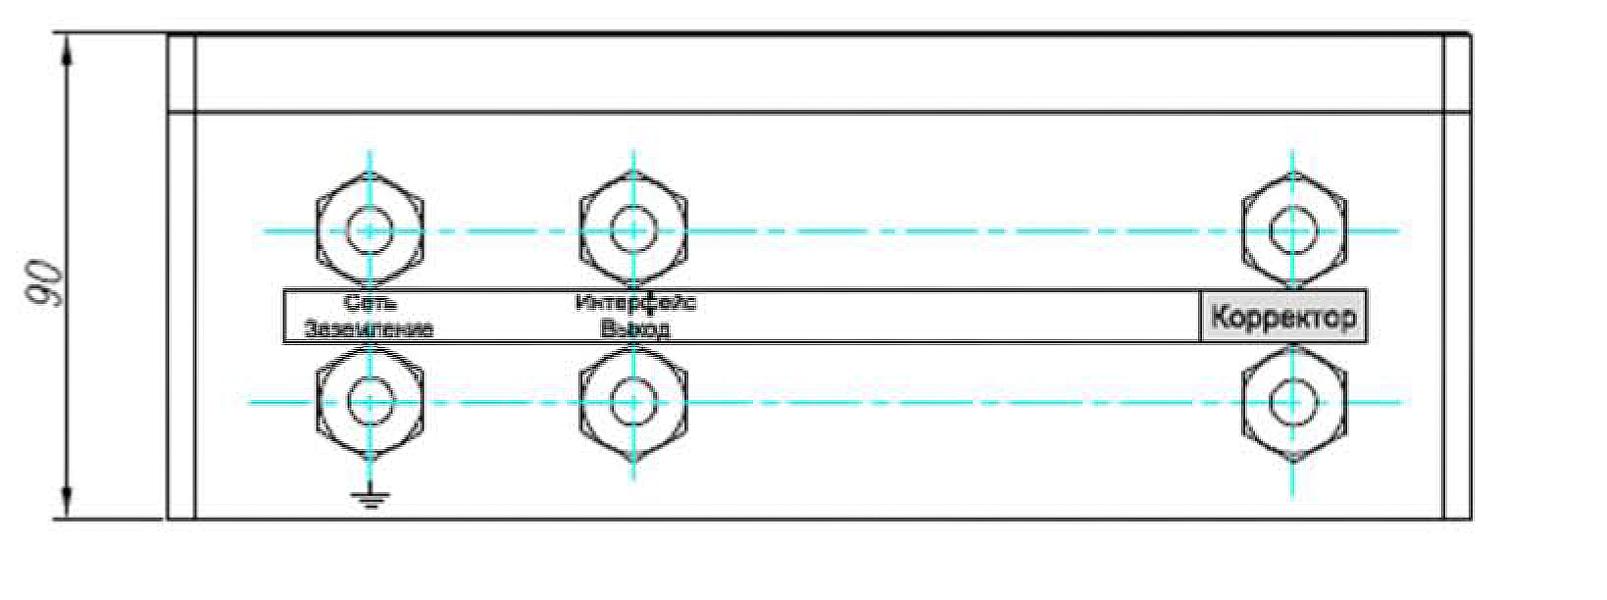 Габаритный чертеж блока питания БПЭК-02/М